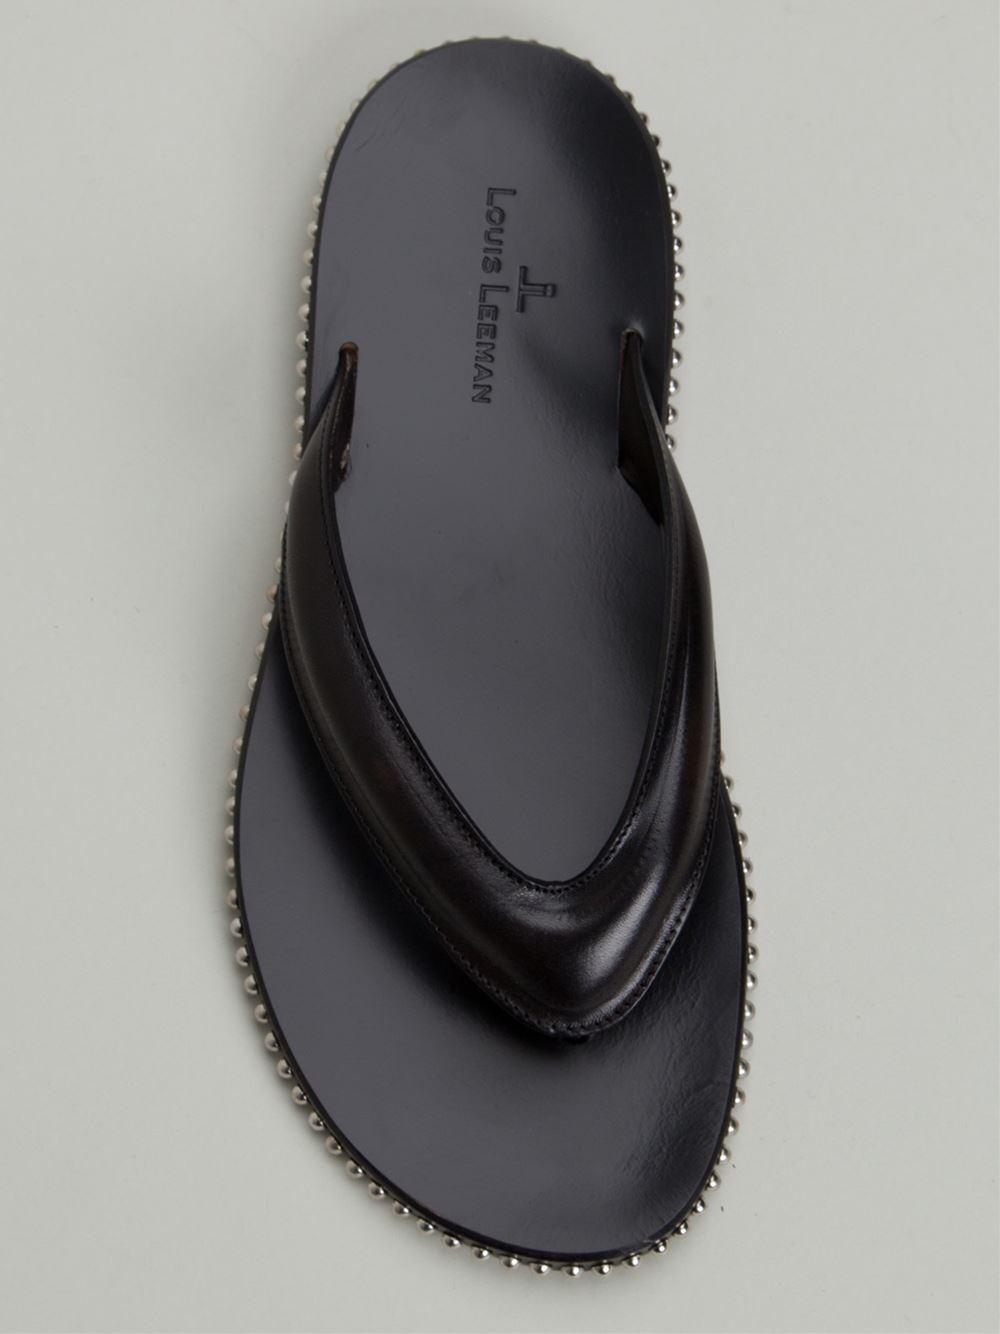 Louis Leeman Studded Flip Flops In Black For Men  Lyst-5109